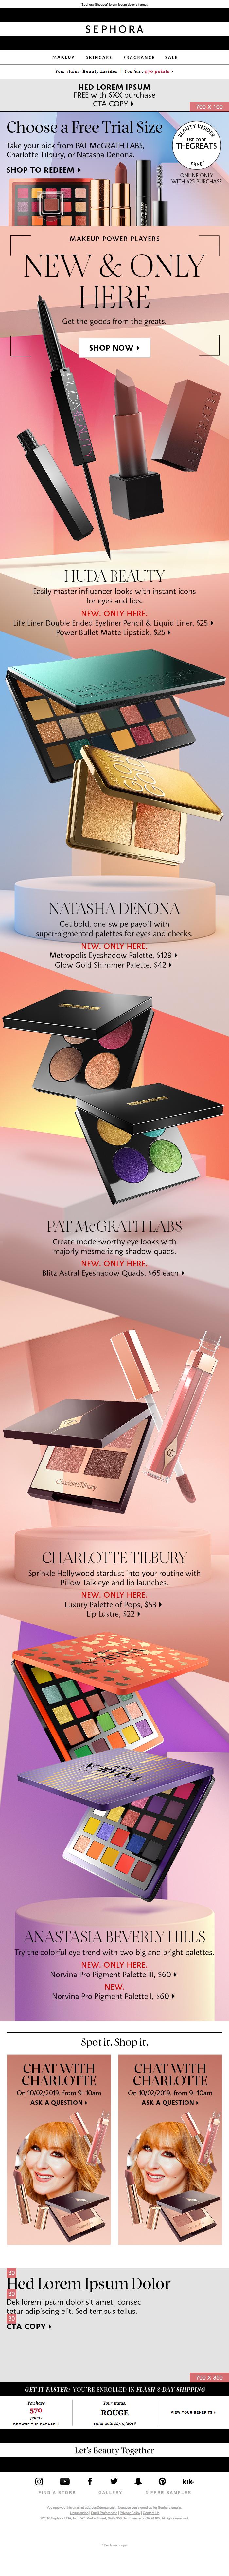 2019-09-25-makeupmavens-email-dedicated.jpg